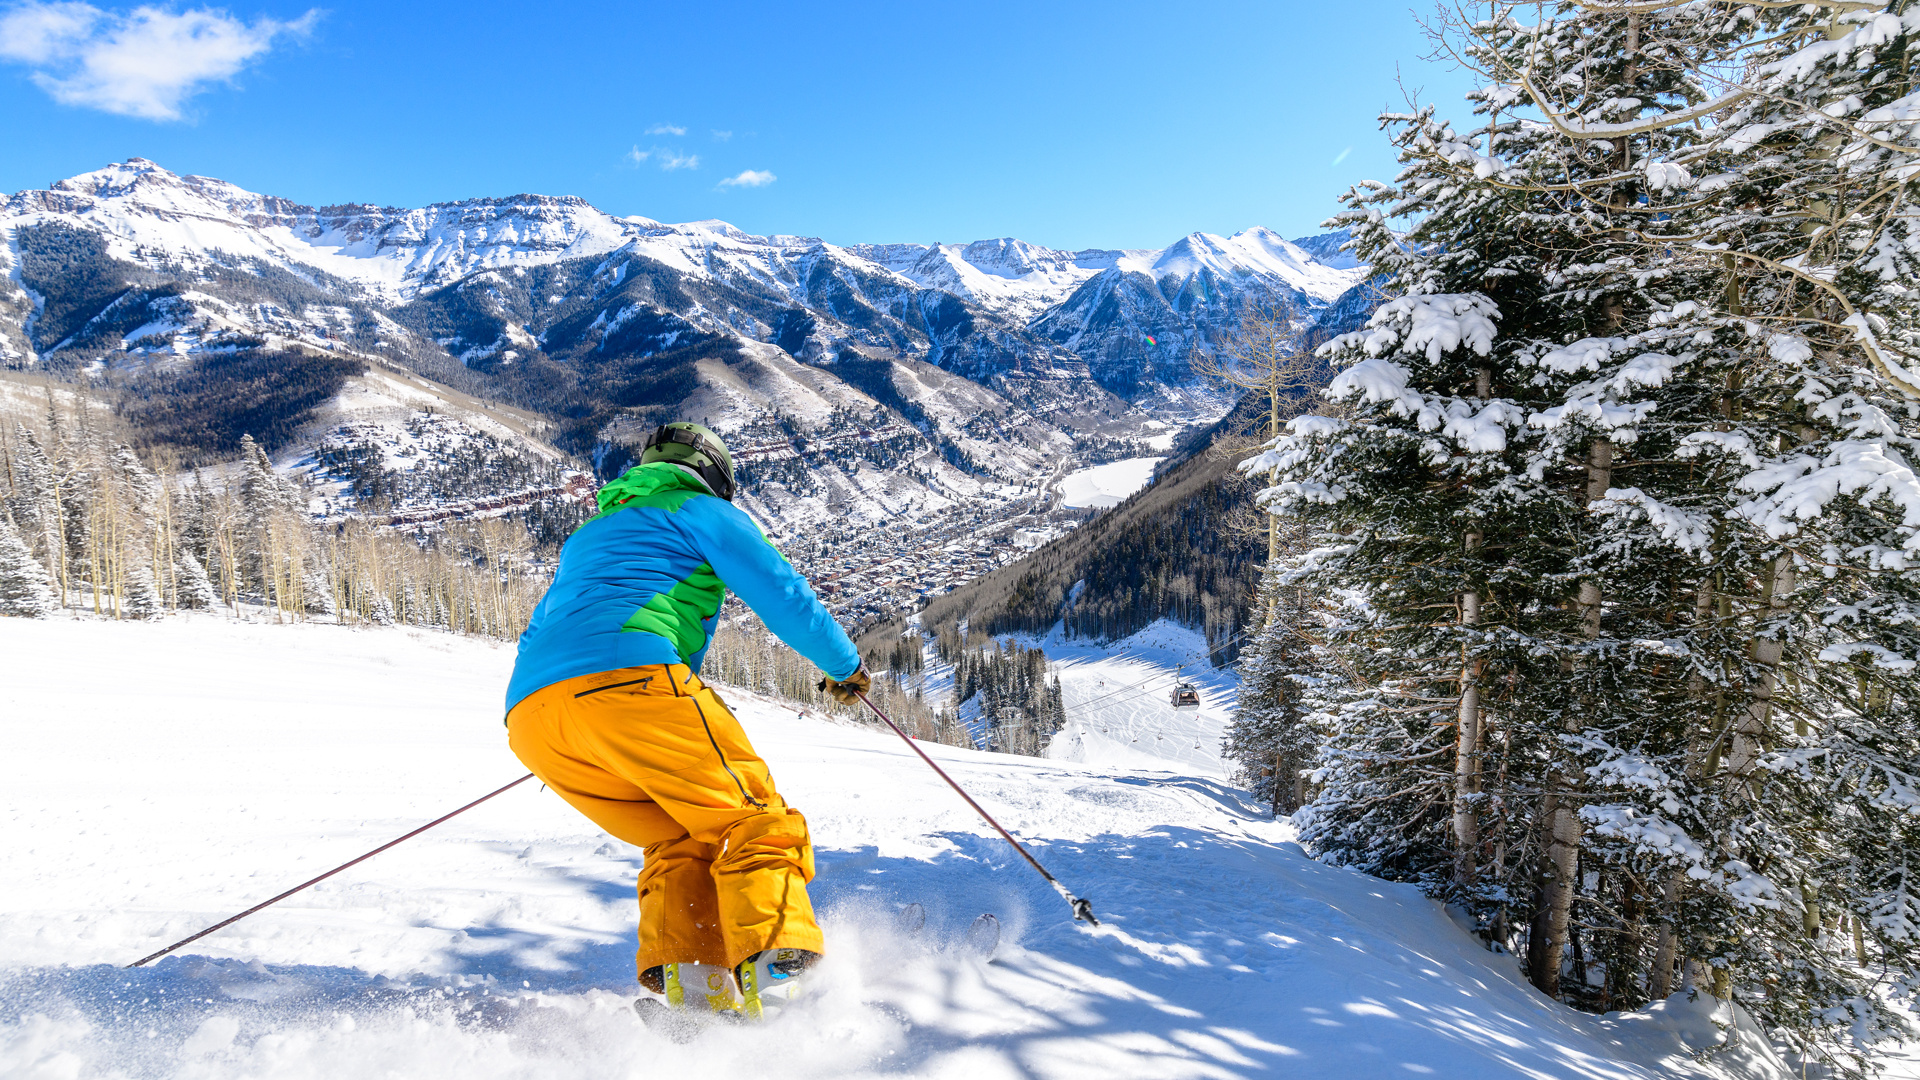 The best ski slopes around the world